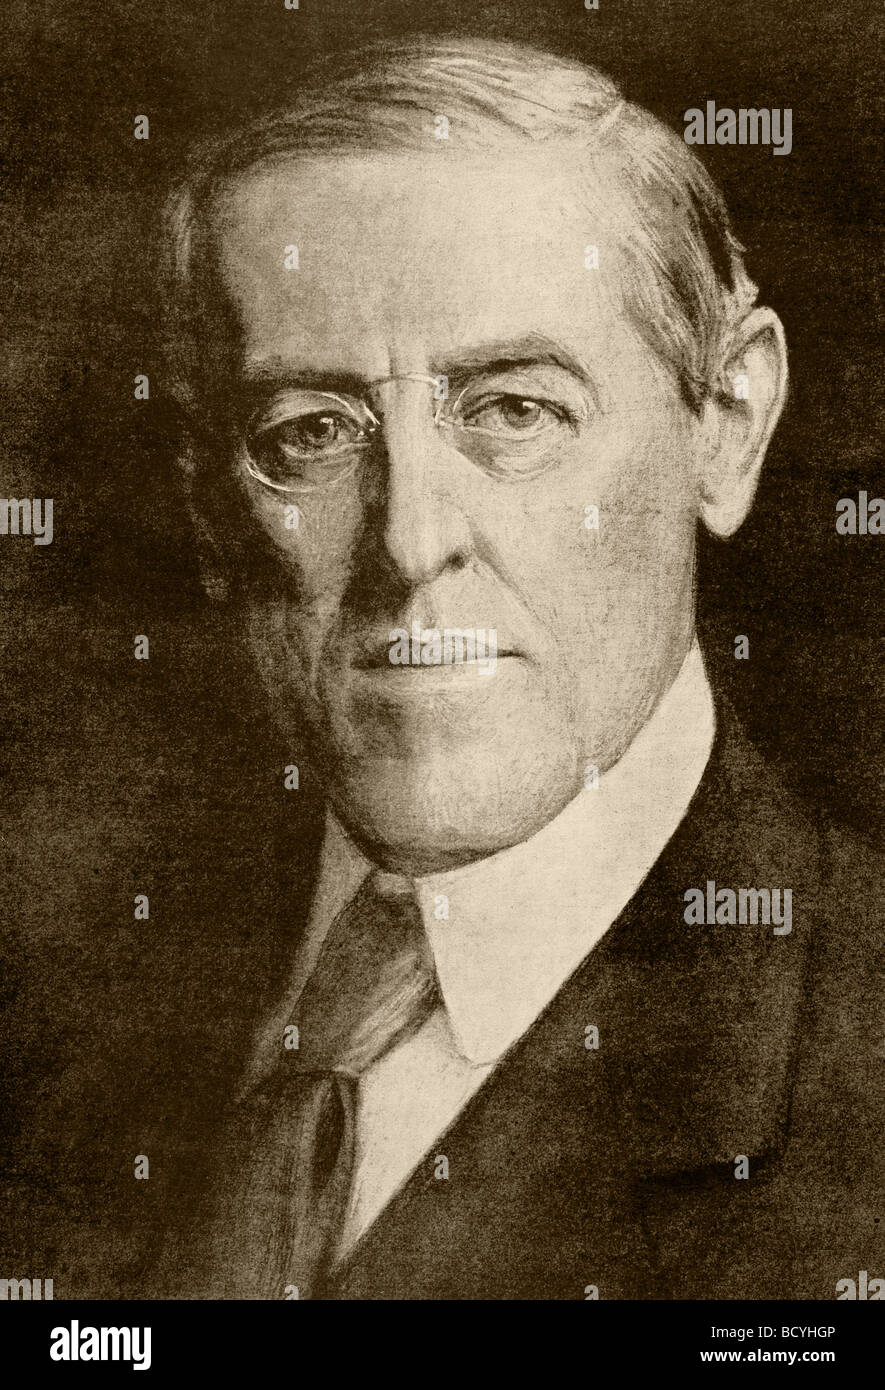 Thomas Woodrow Wilson 1856 to 1924.  28th President of the United States. - Stock Image